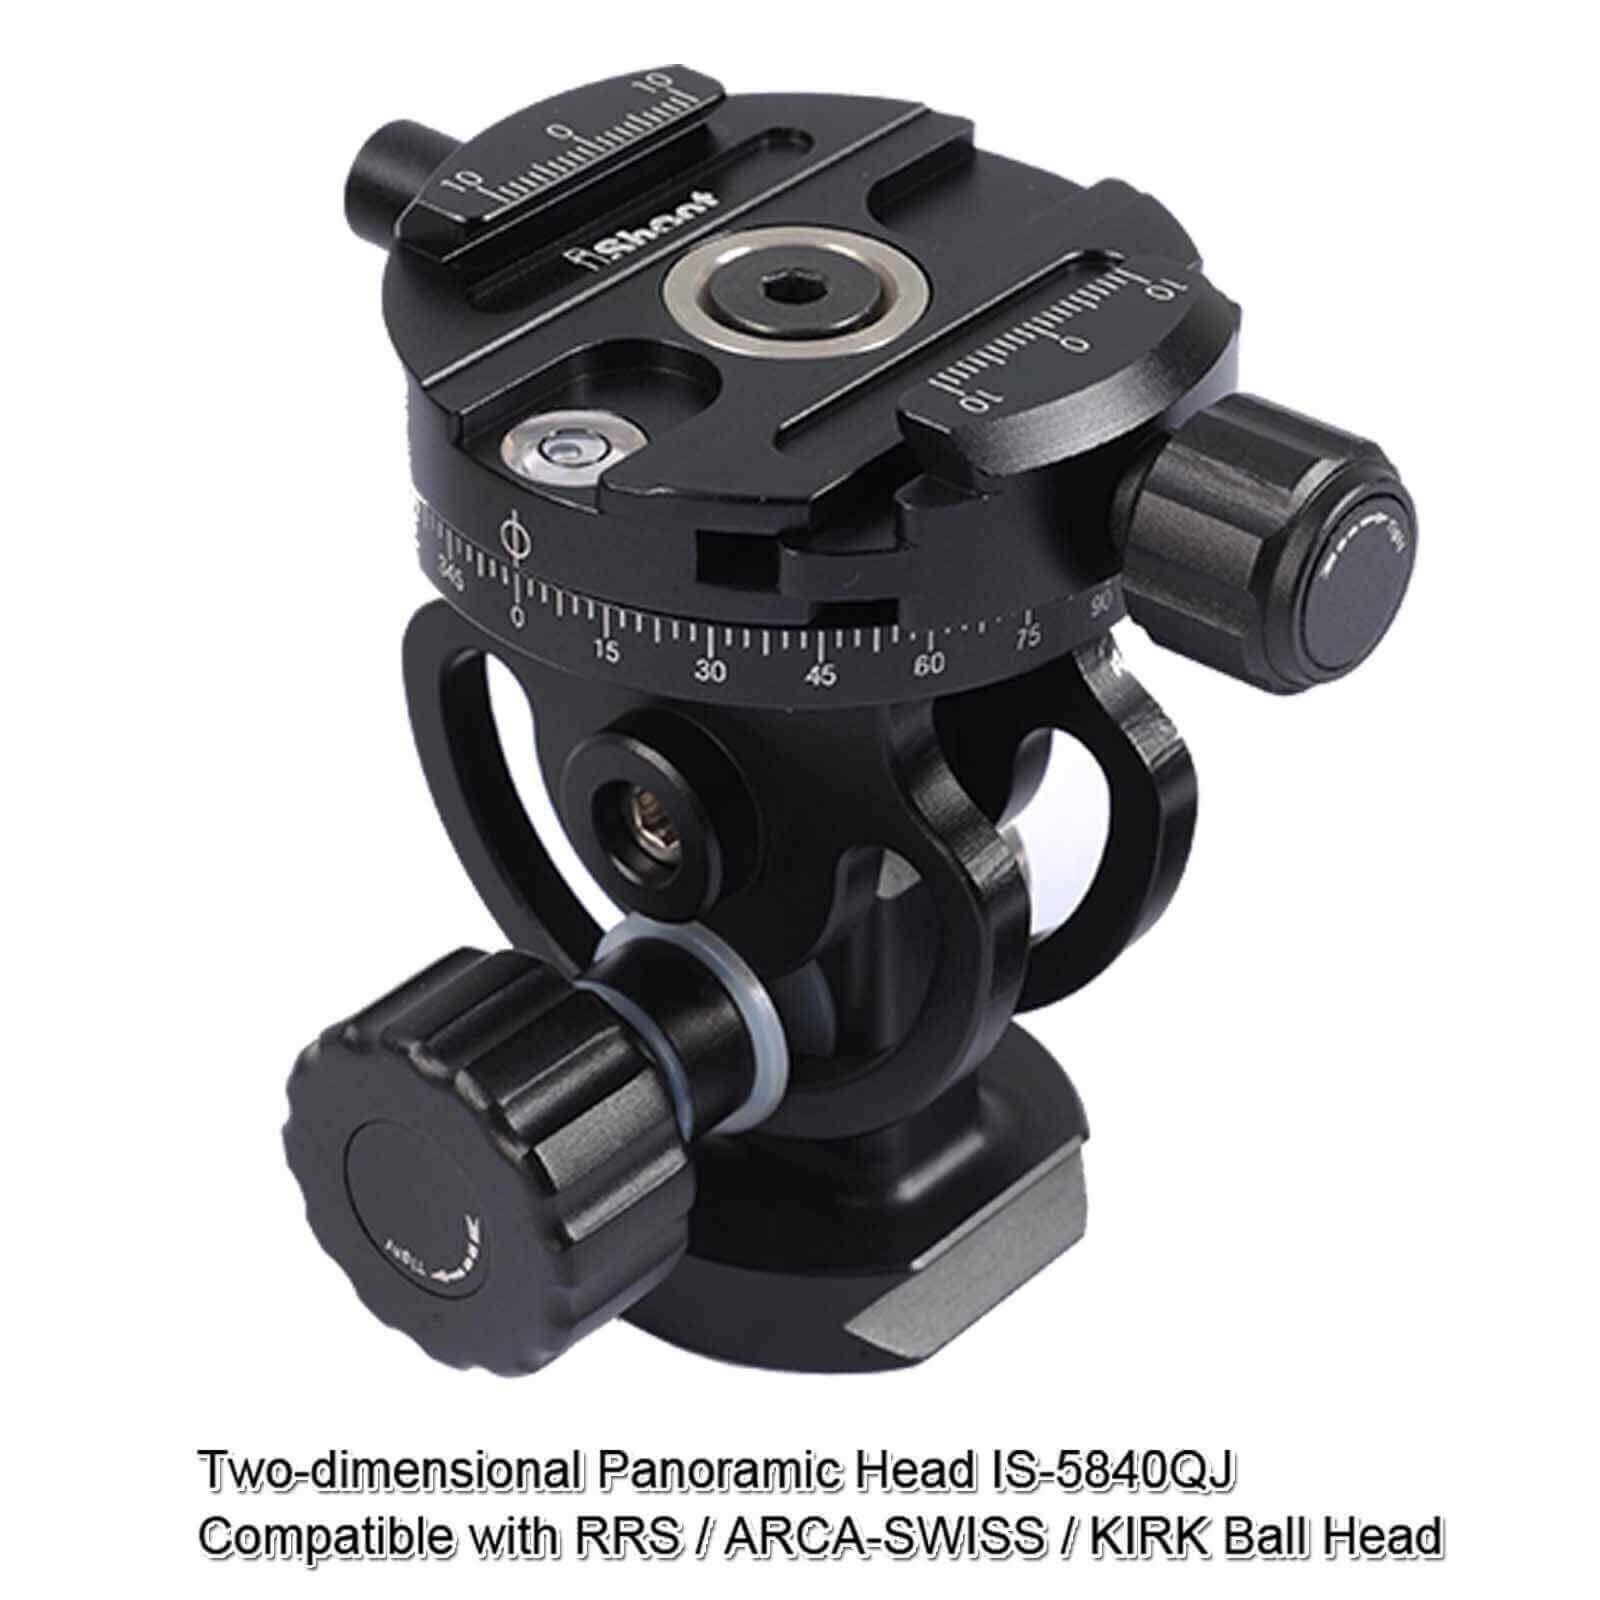 360 ° Pantoscopic Precision Panoramic Tripod Head Mount For 5D2 5D3 GH4 BMPCC